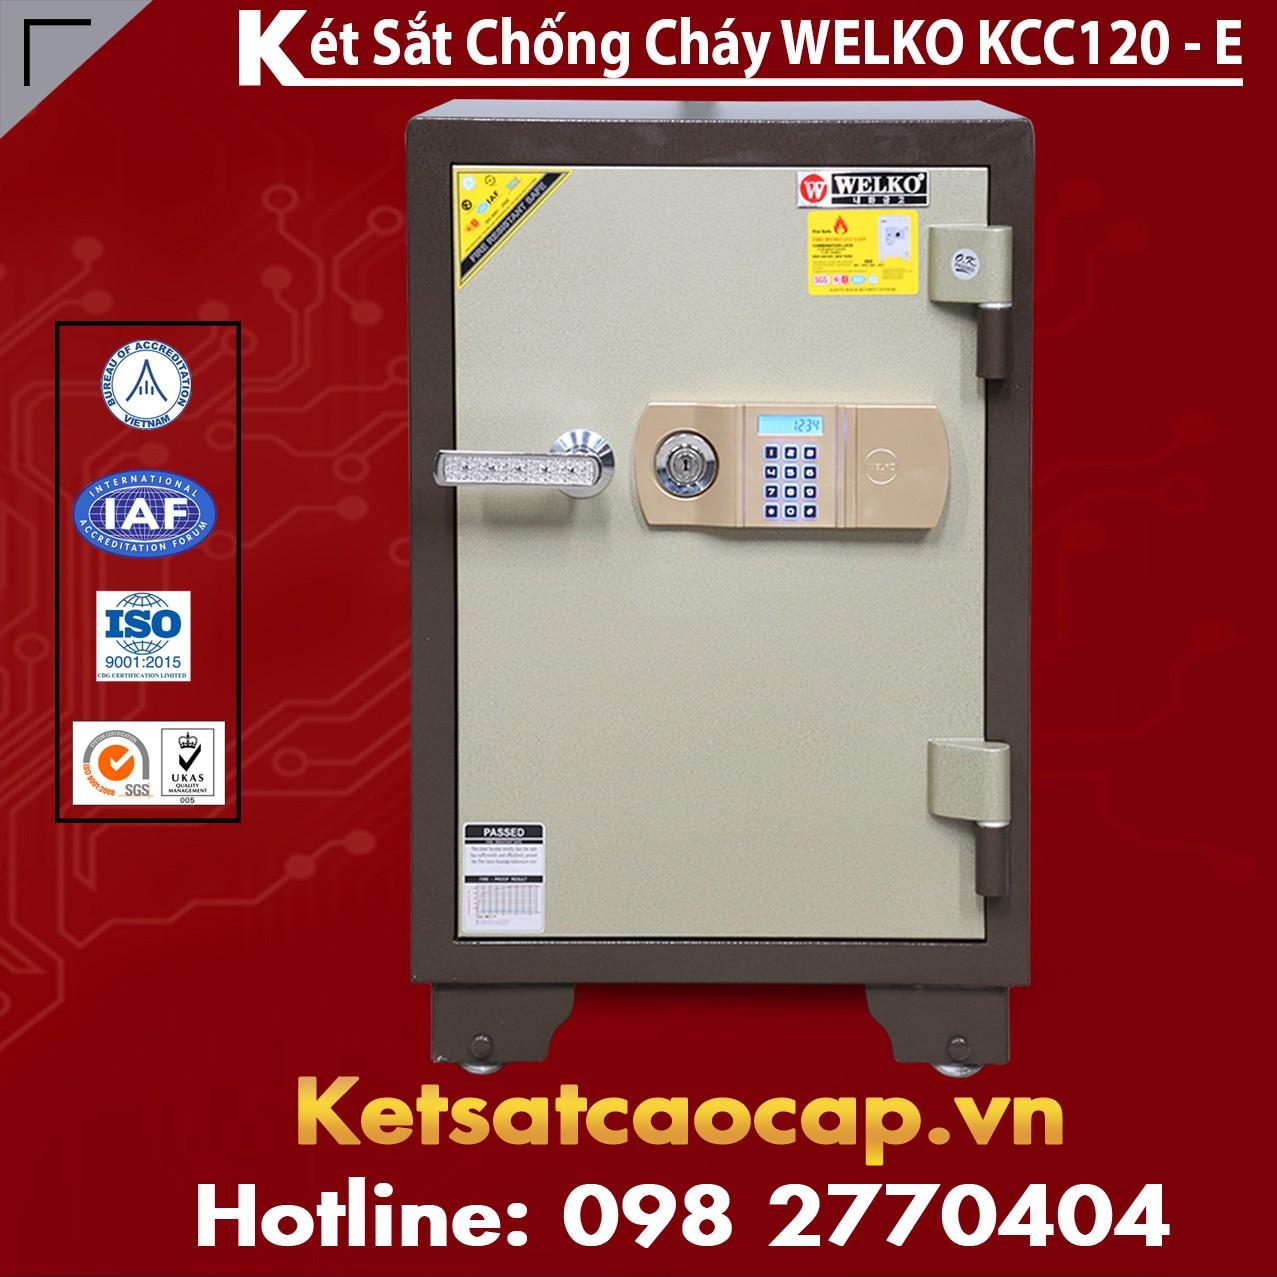 Két Sắt Thông Minh KCC120 E - Brown